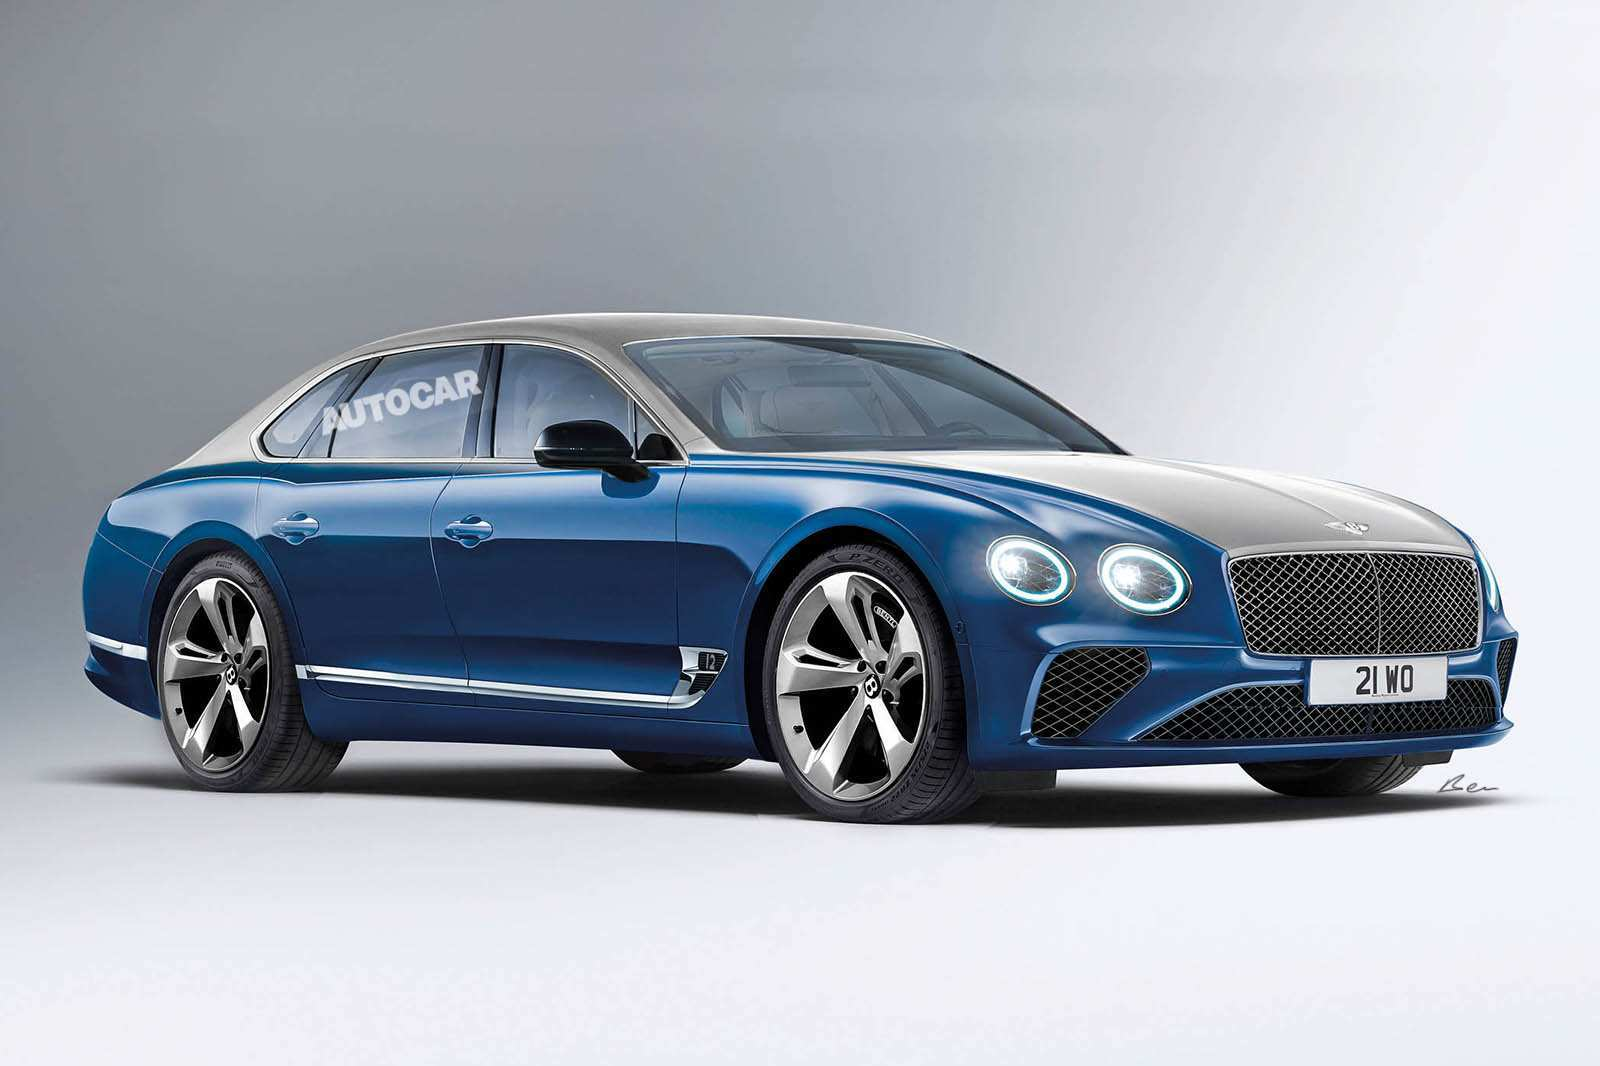 17 New Bentley Neuheiten 2020 Spy Shoot with Bentley Neuheiten 2020